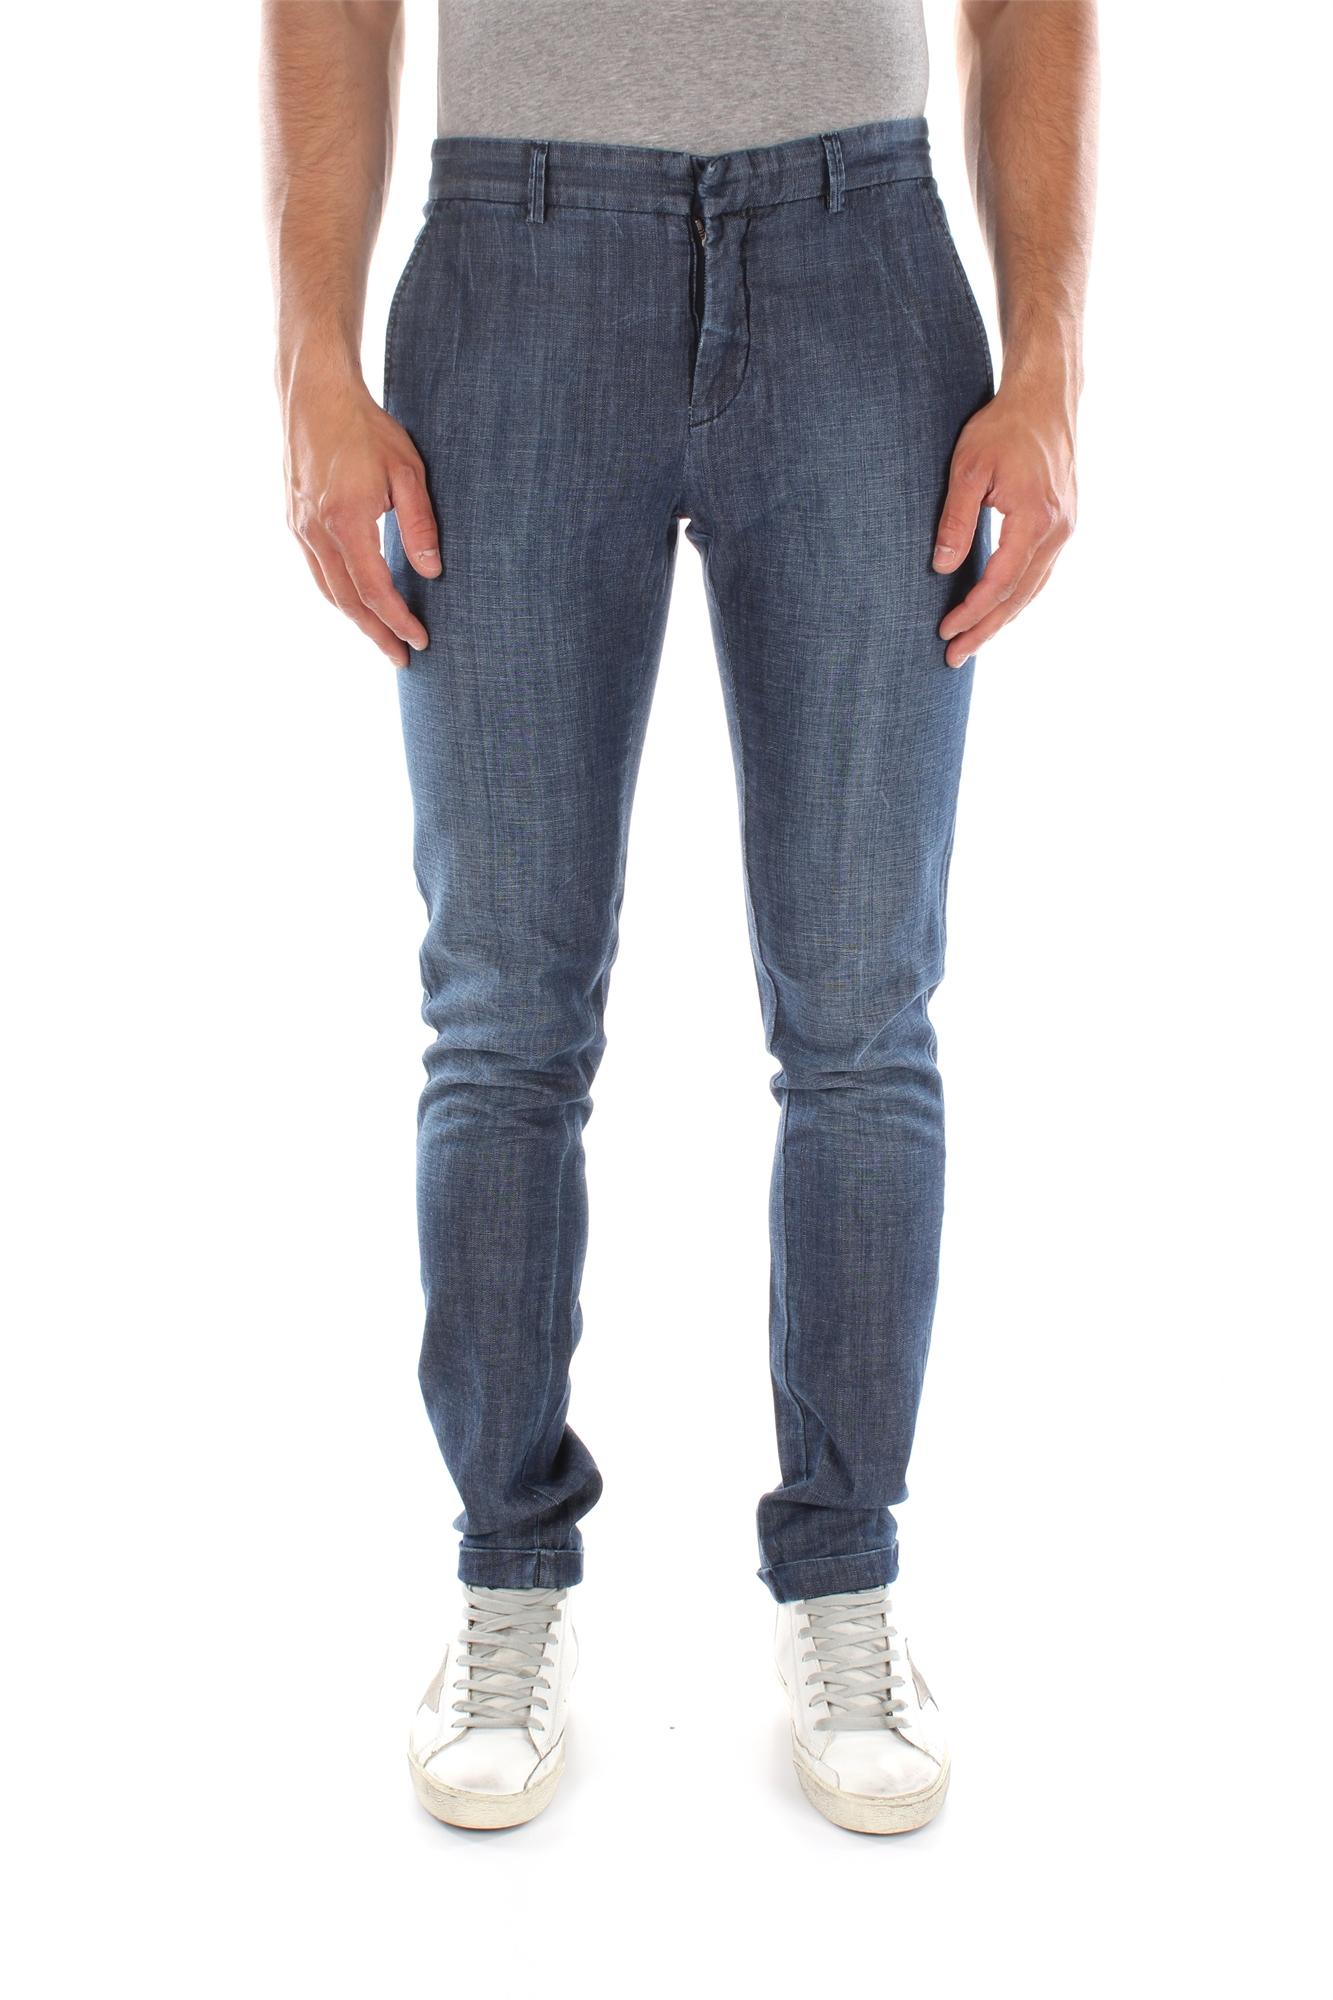 Jeans Pierre Balmain Men Cotton Blue 6M210008549700   eBay